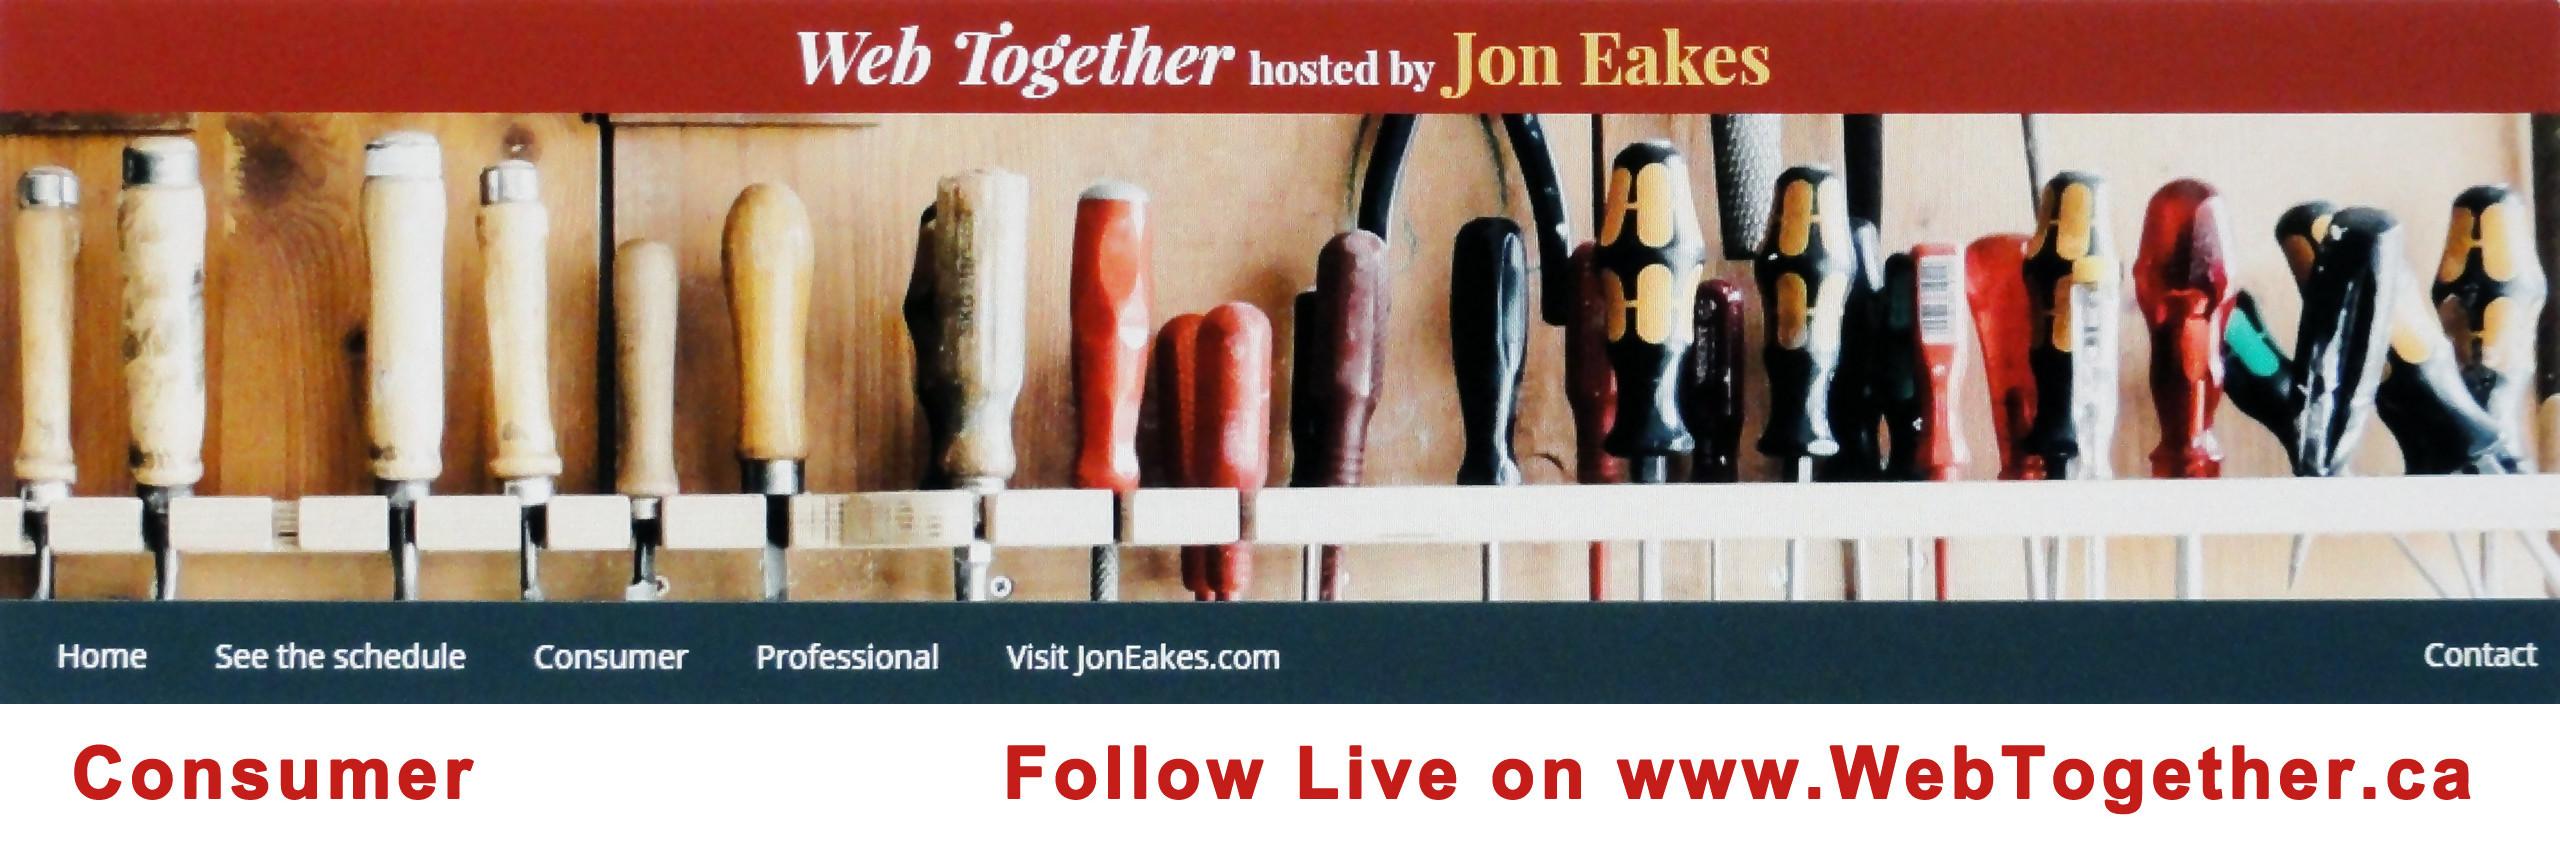 Ask Jon Eakes Live: Home Improvements